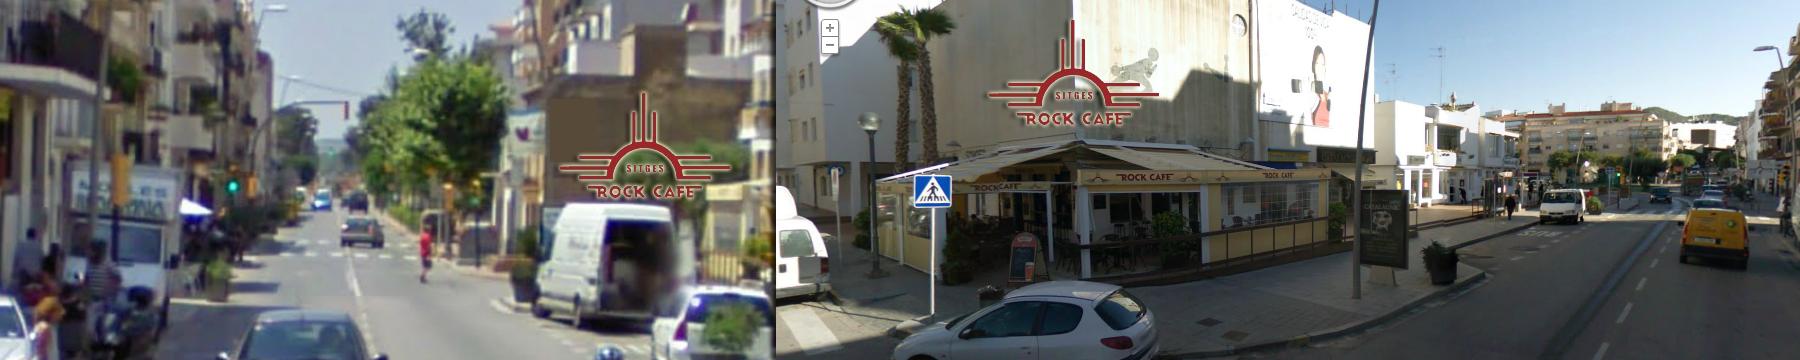 Sitges Rock Cafe Location